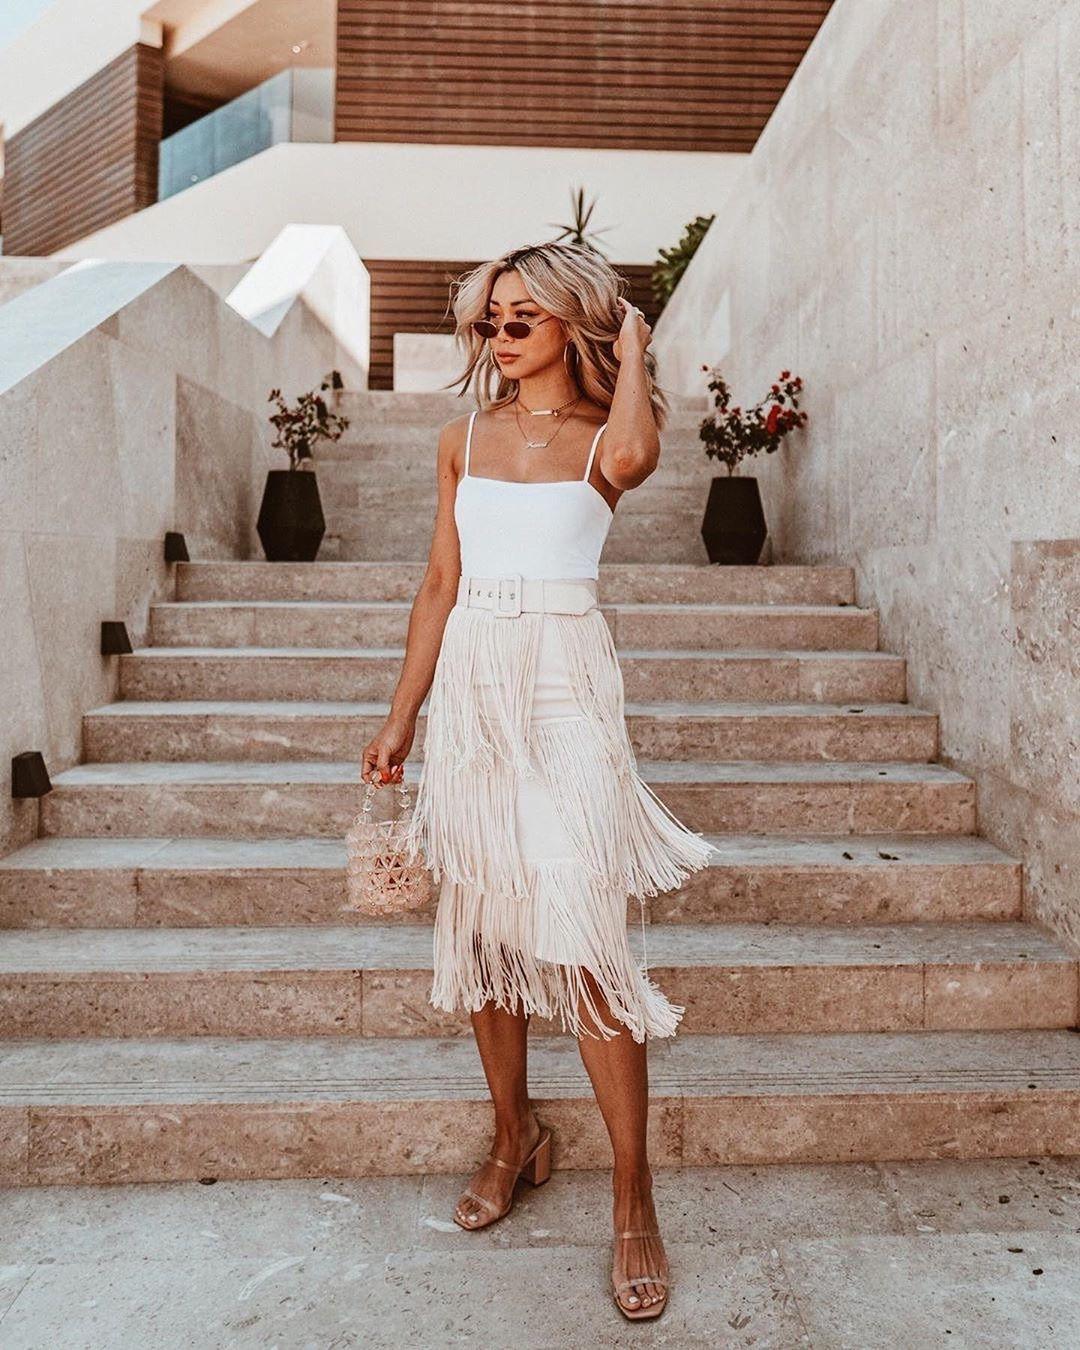 L Academie On Instagram Fairly Fringe Flamcis In The Roi Midi Skirt Link In Bio To Shop Glam Fashion Skirts Midi Skirt